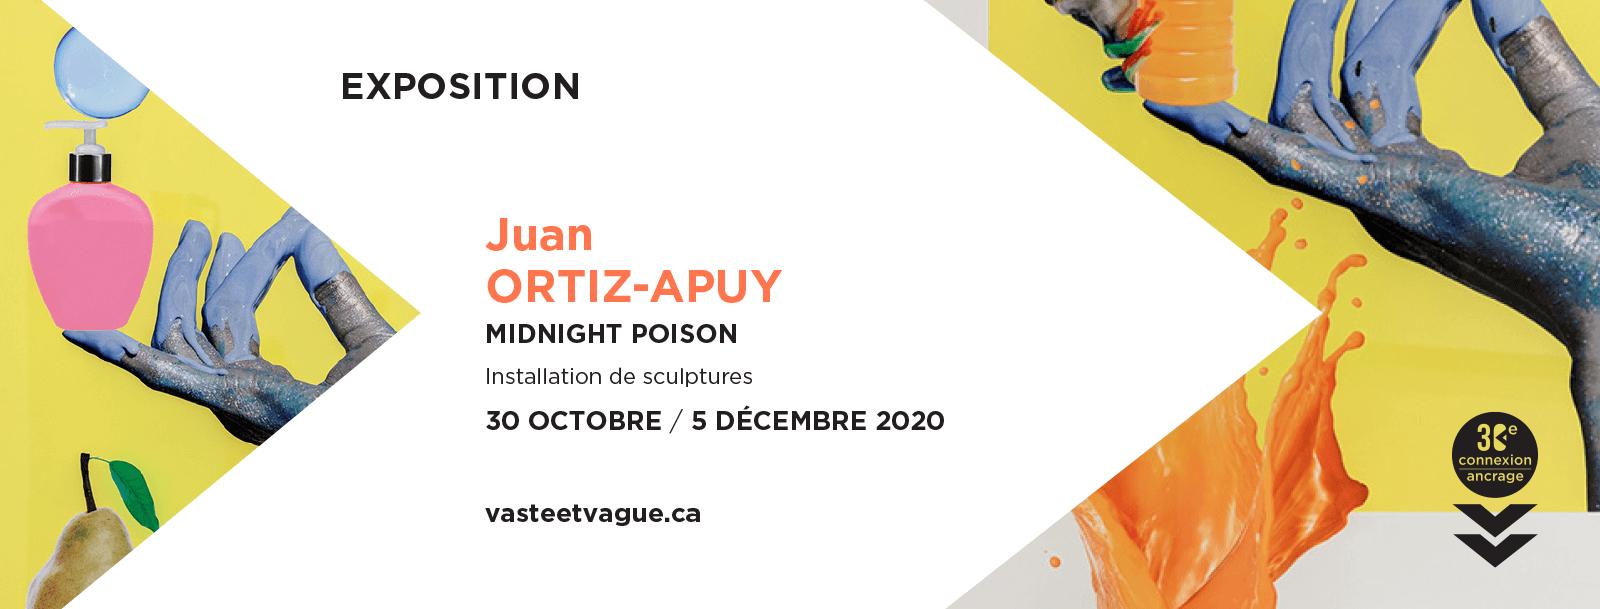 MIDNIGHT POISON | Installation | Juan ORTIZ-APUY